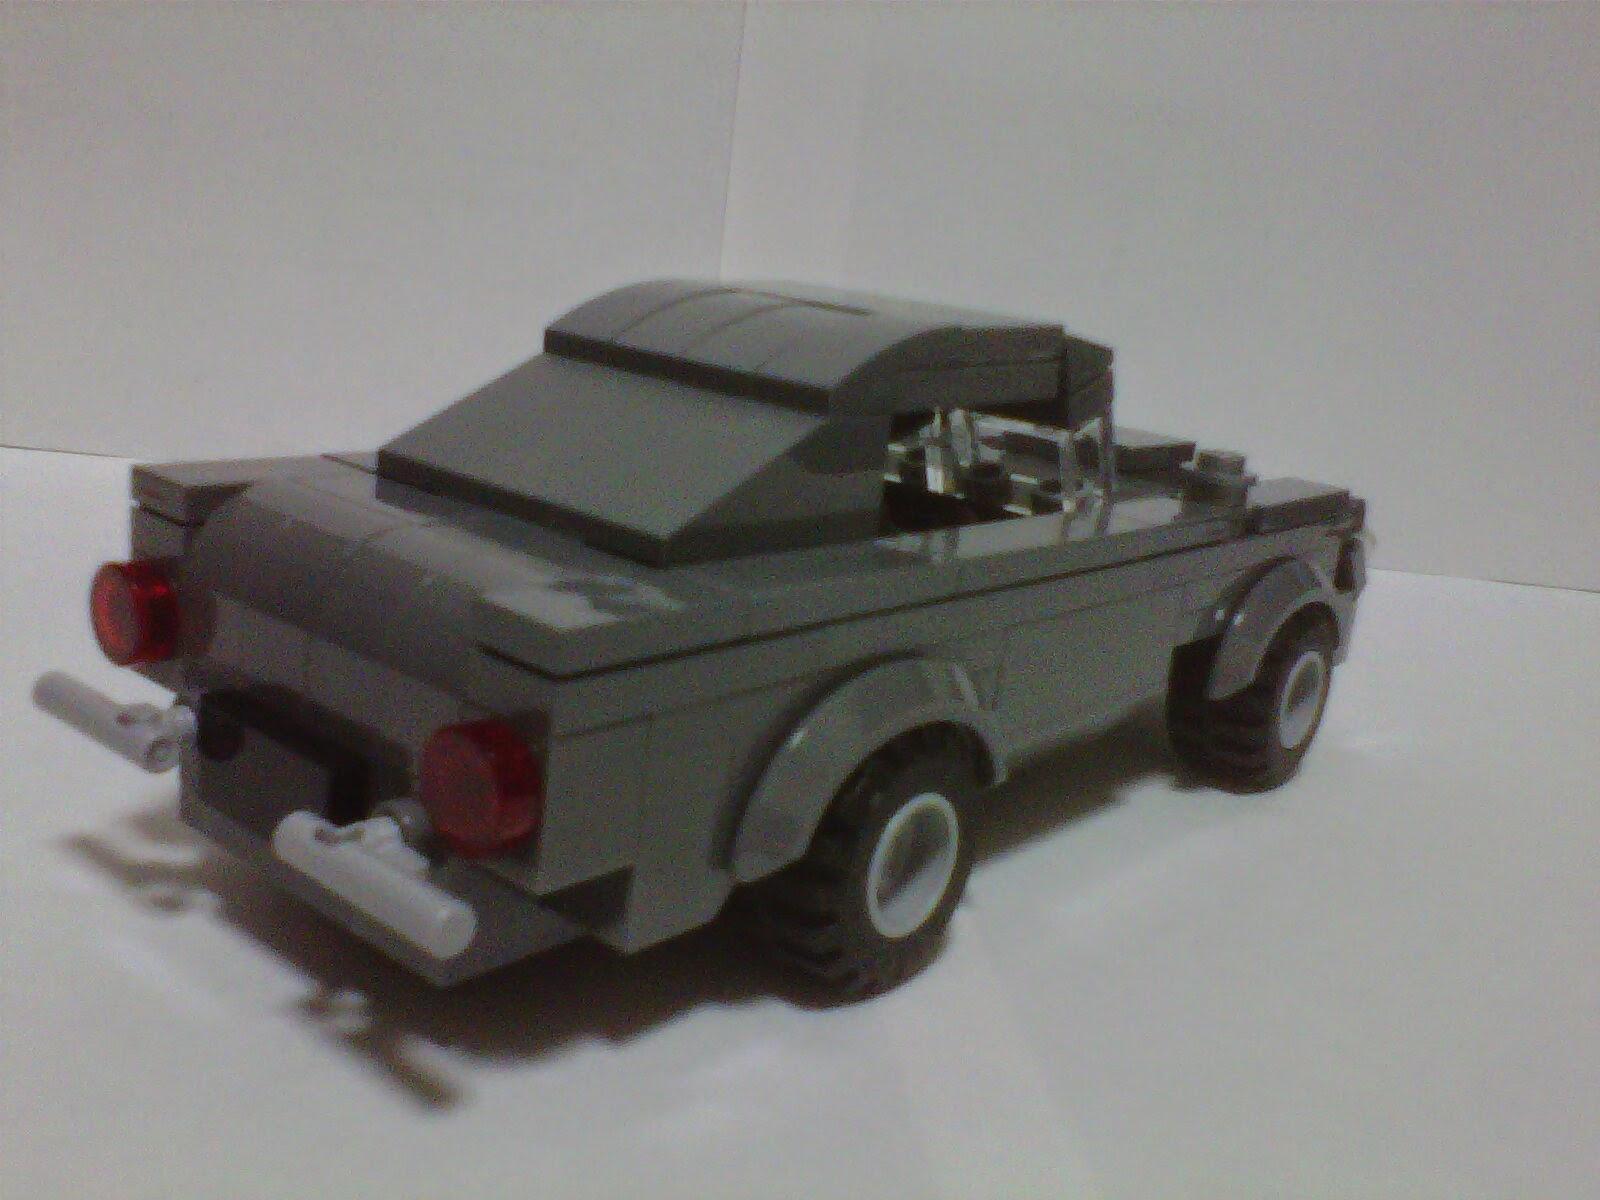 ONCE UPON A TIME:  DB5 LEGO Astin Martin DB5 Moc